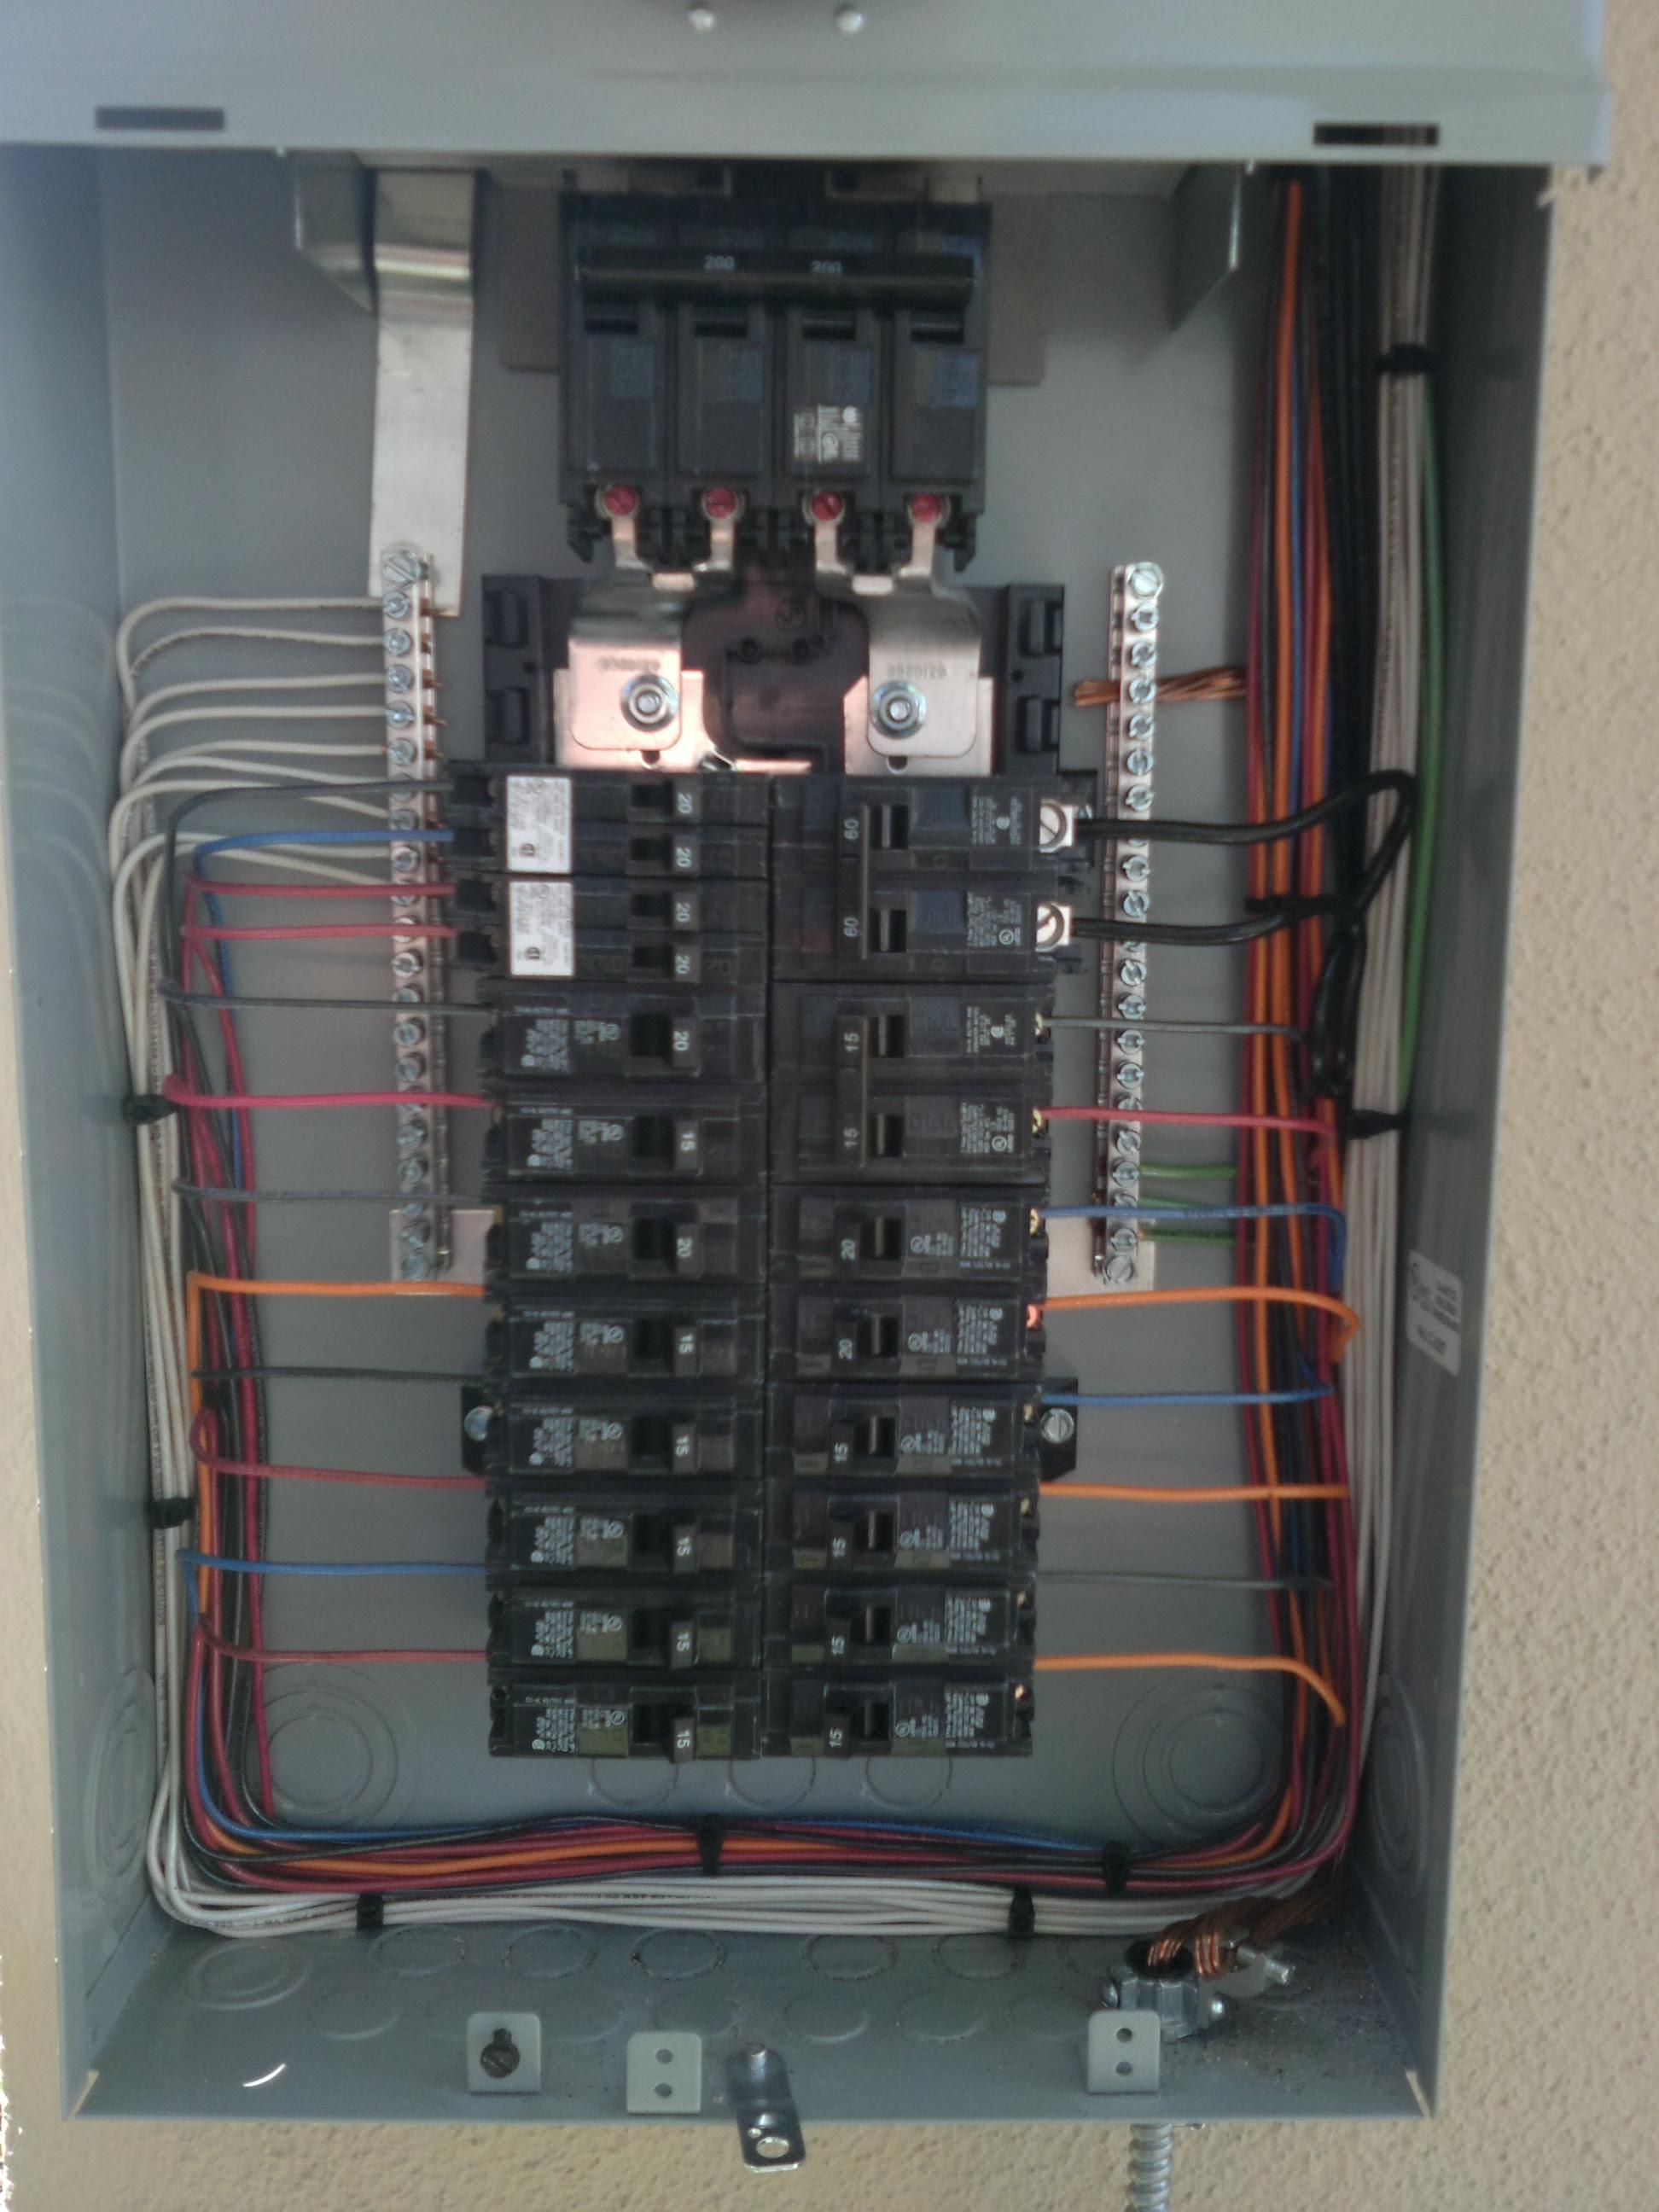 Diagram Zinsco Breaker Wiring Diagram Full Version Hd Quality Wiring Diagram Tvjobs Delicemiss Fr